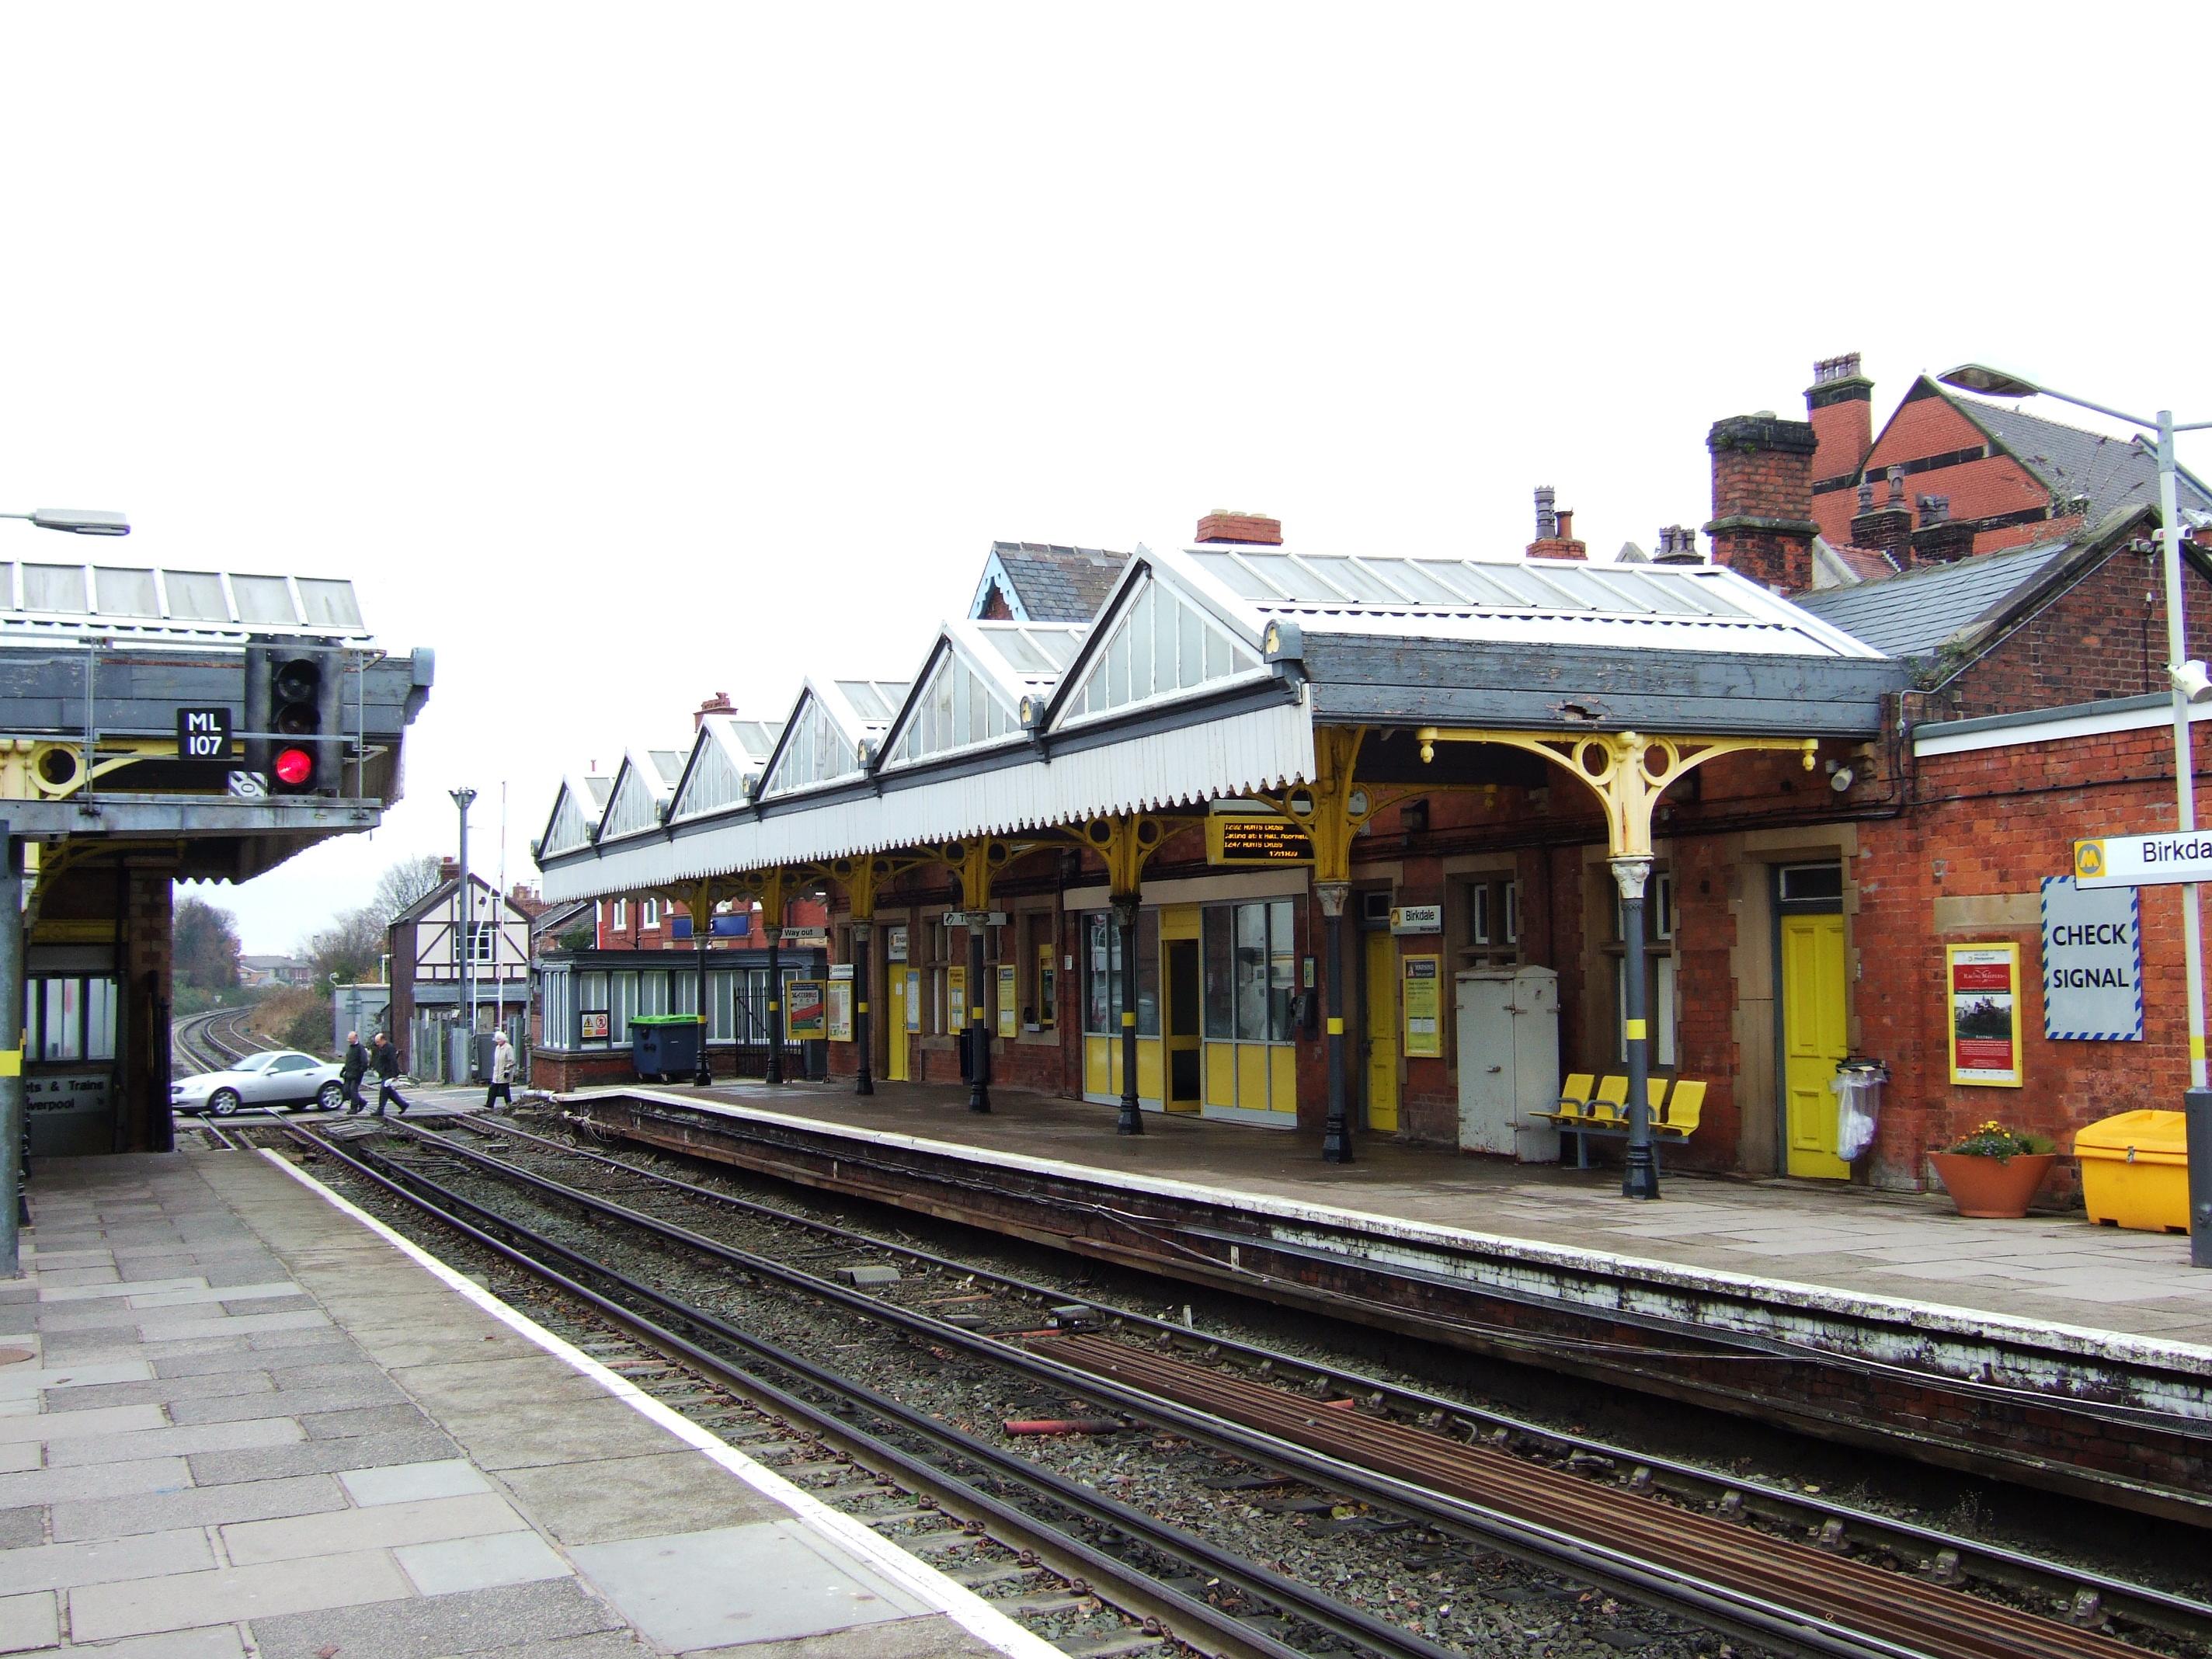 FileBirkdale Railway StationJPG Wikimedia Commons